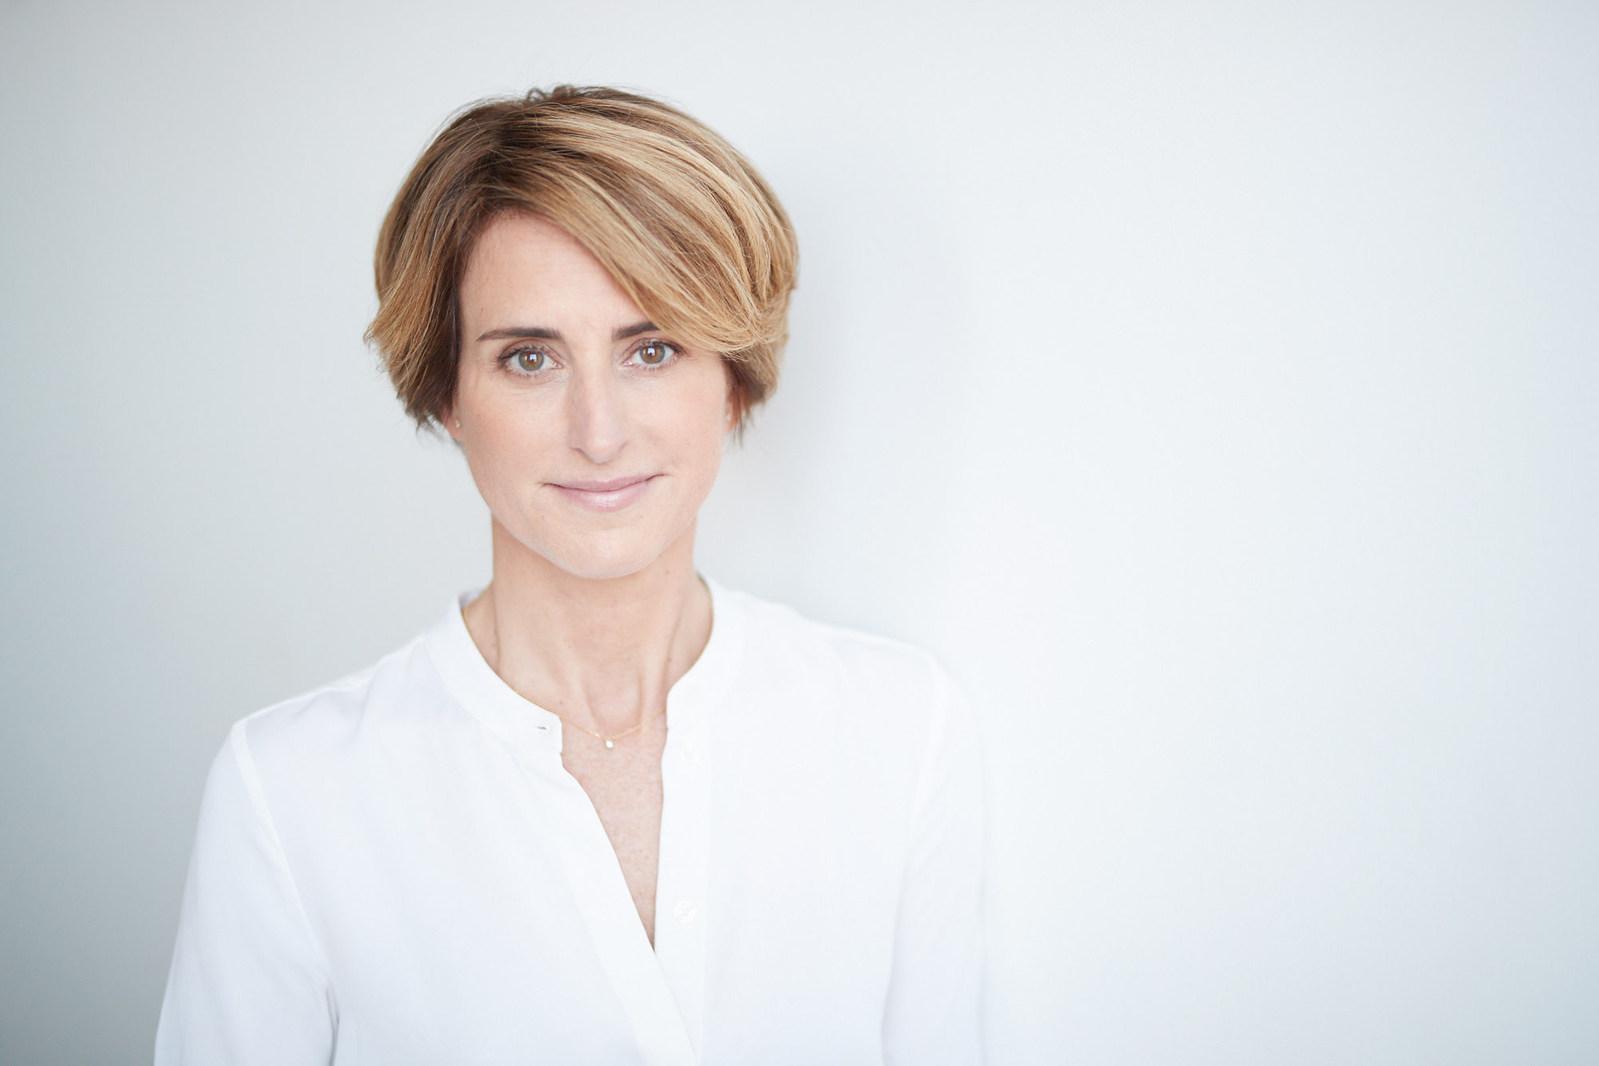 Annick Guérard is Transat's new COO